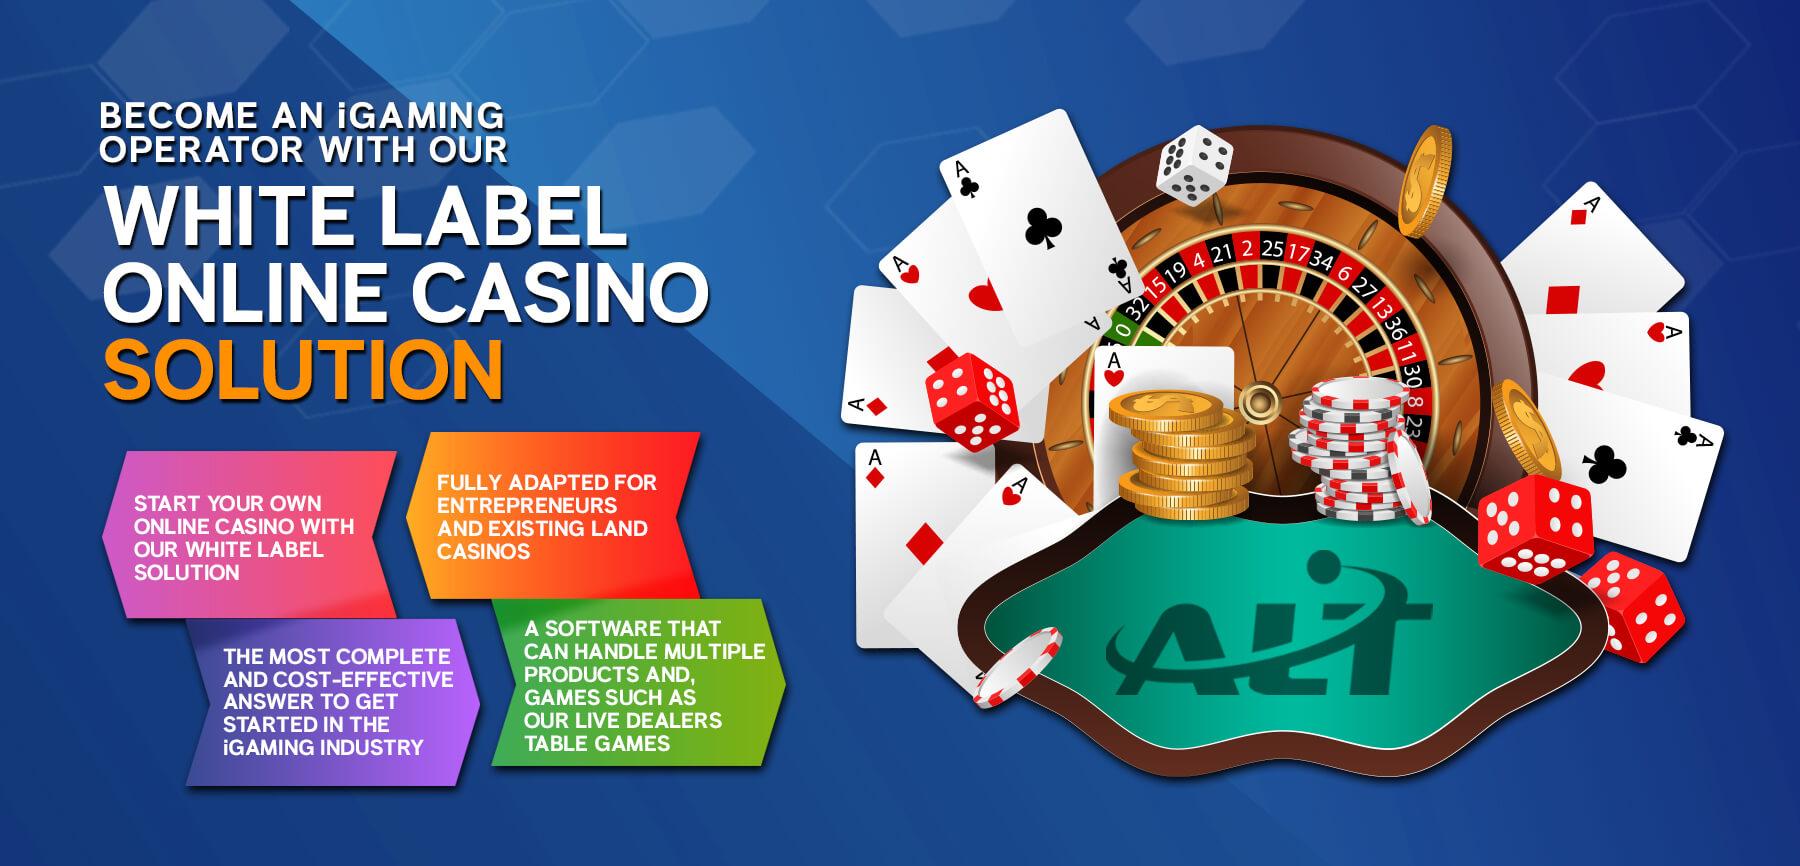 Asia Live Tech White Label Online Casino.jpg